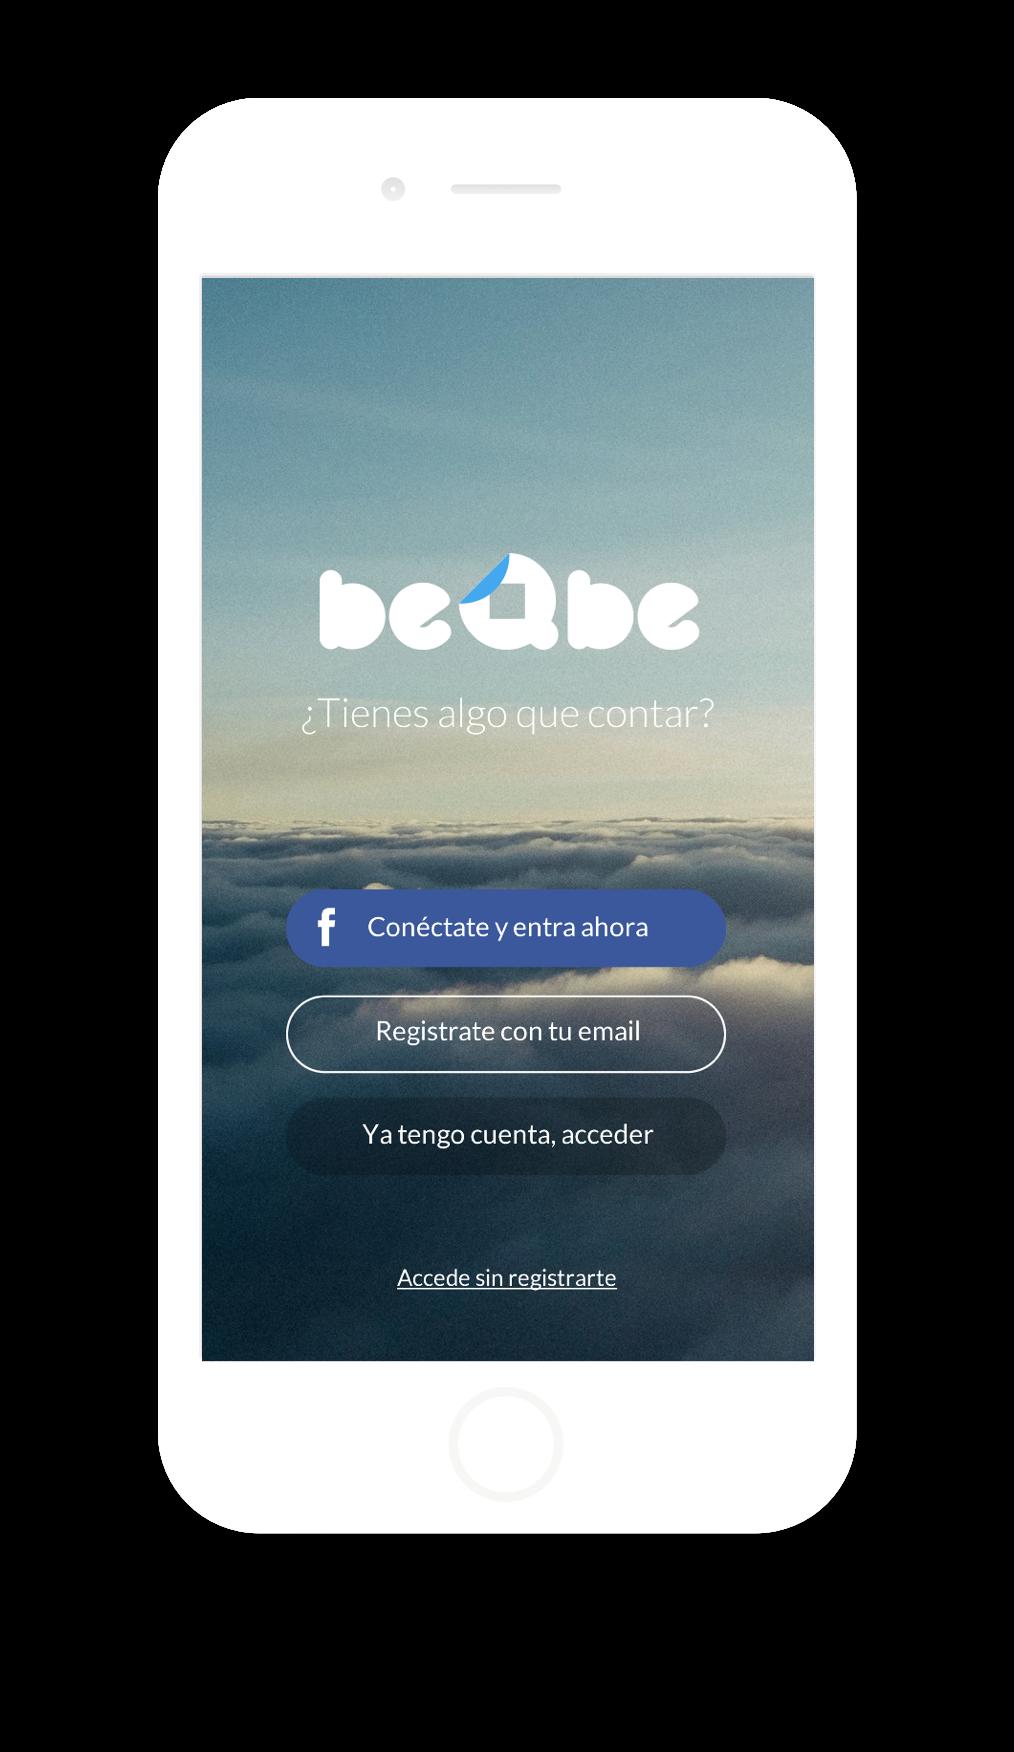 Diseño app beqbe